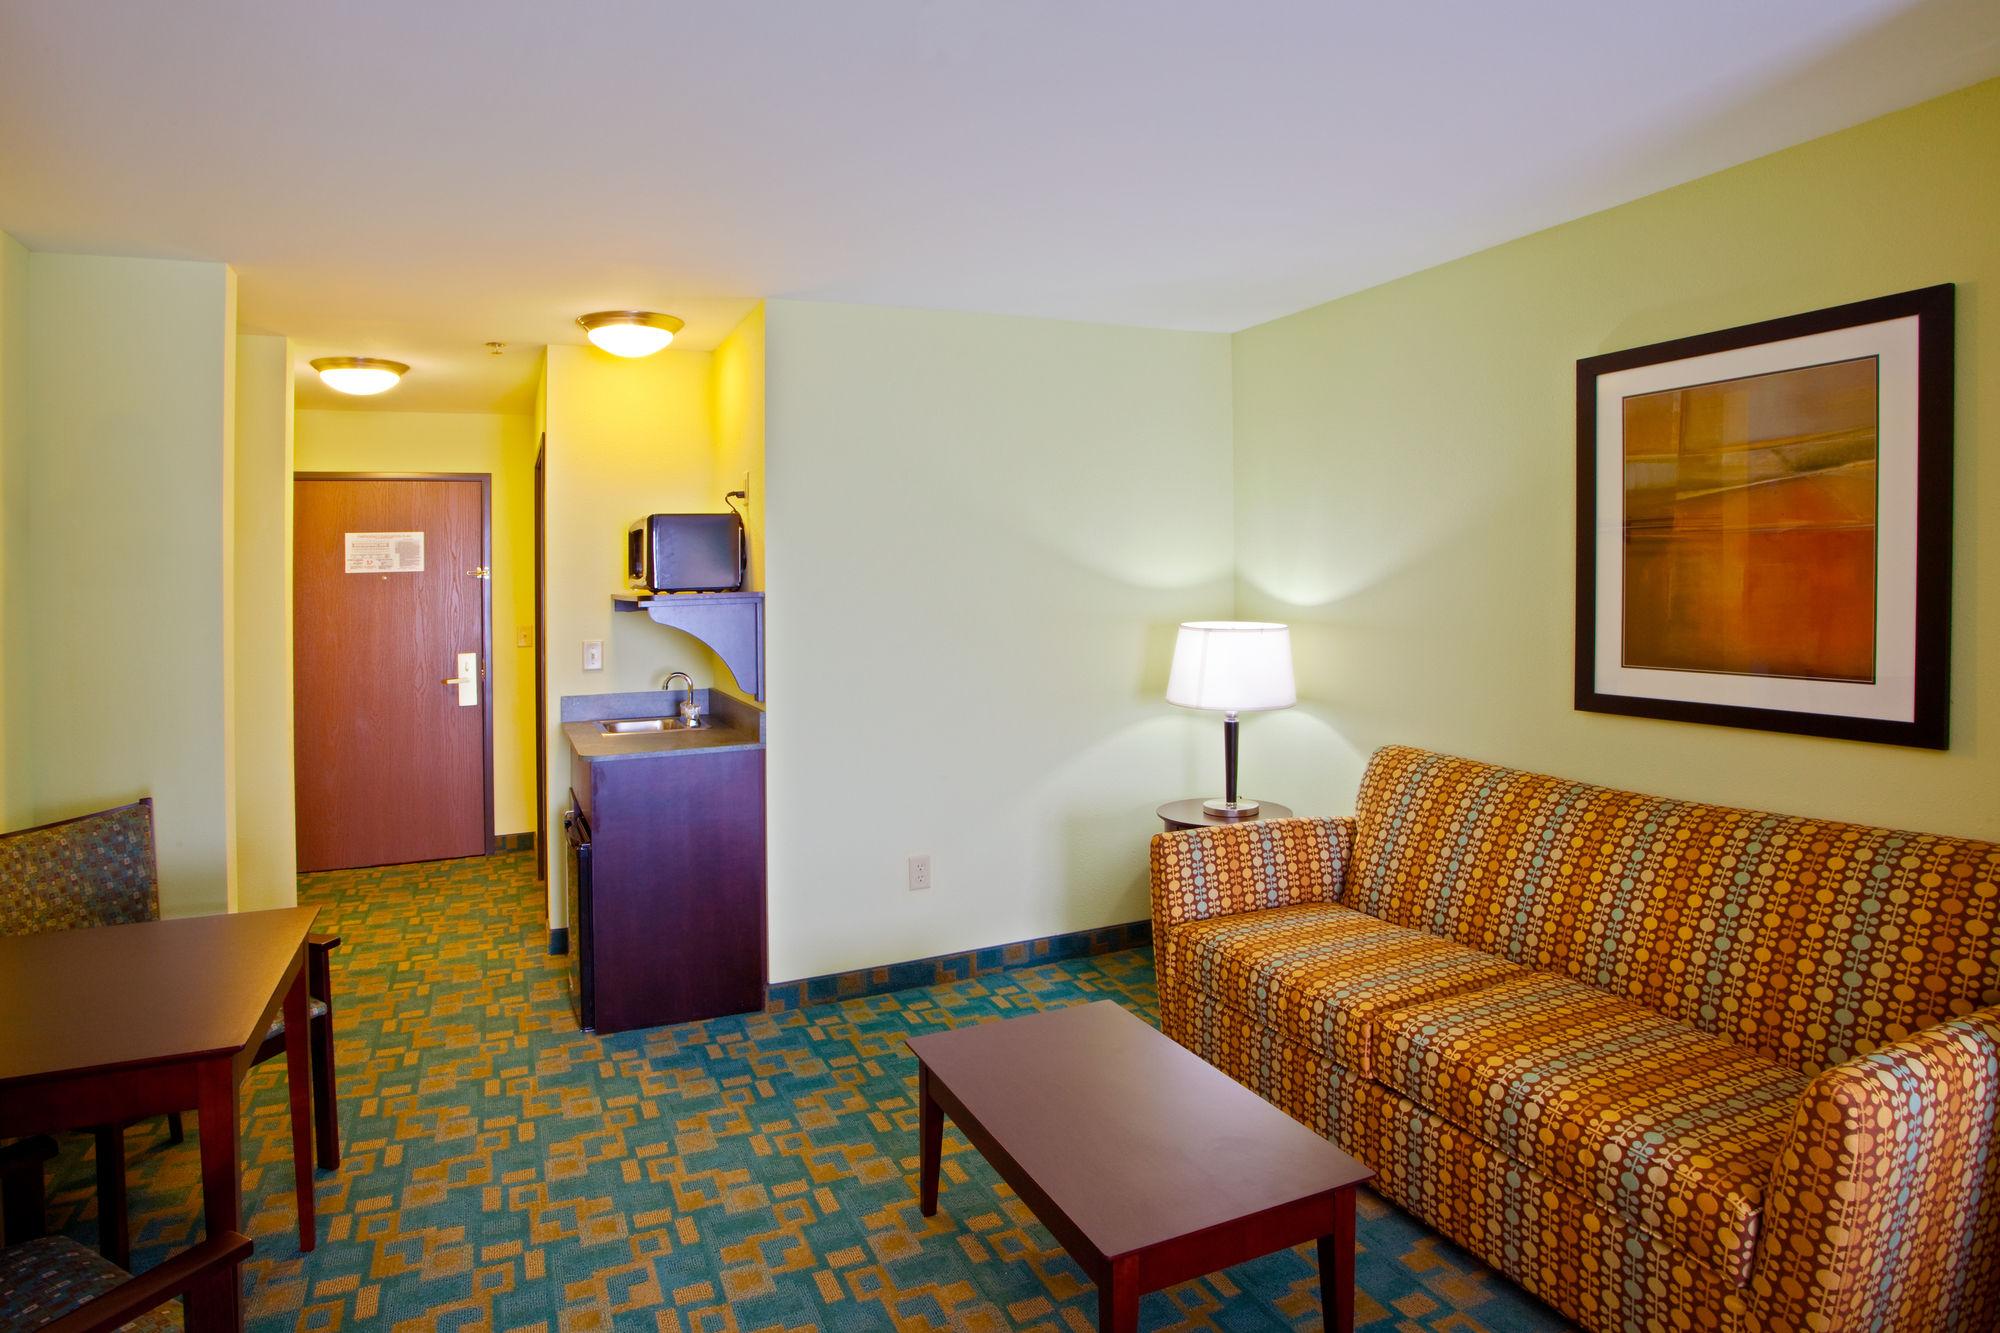 Holiday Inn Express & Suites in Thornburg, VA